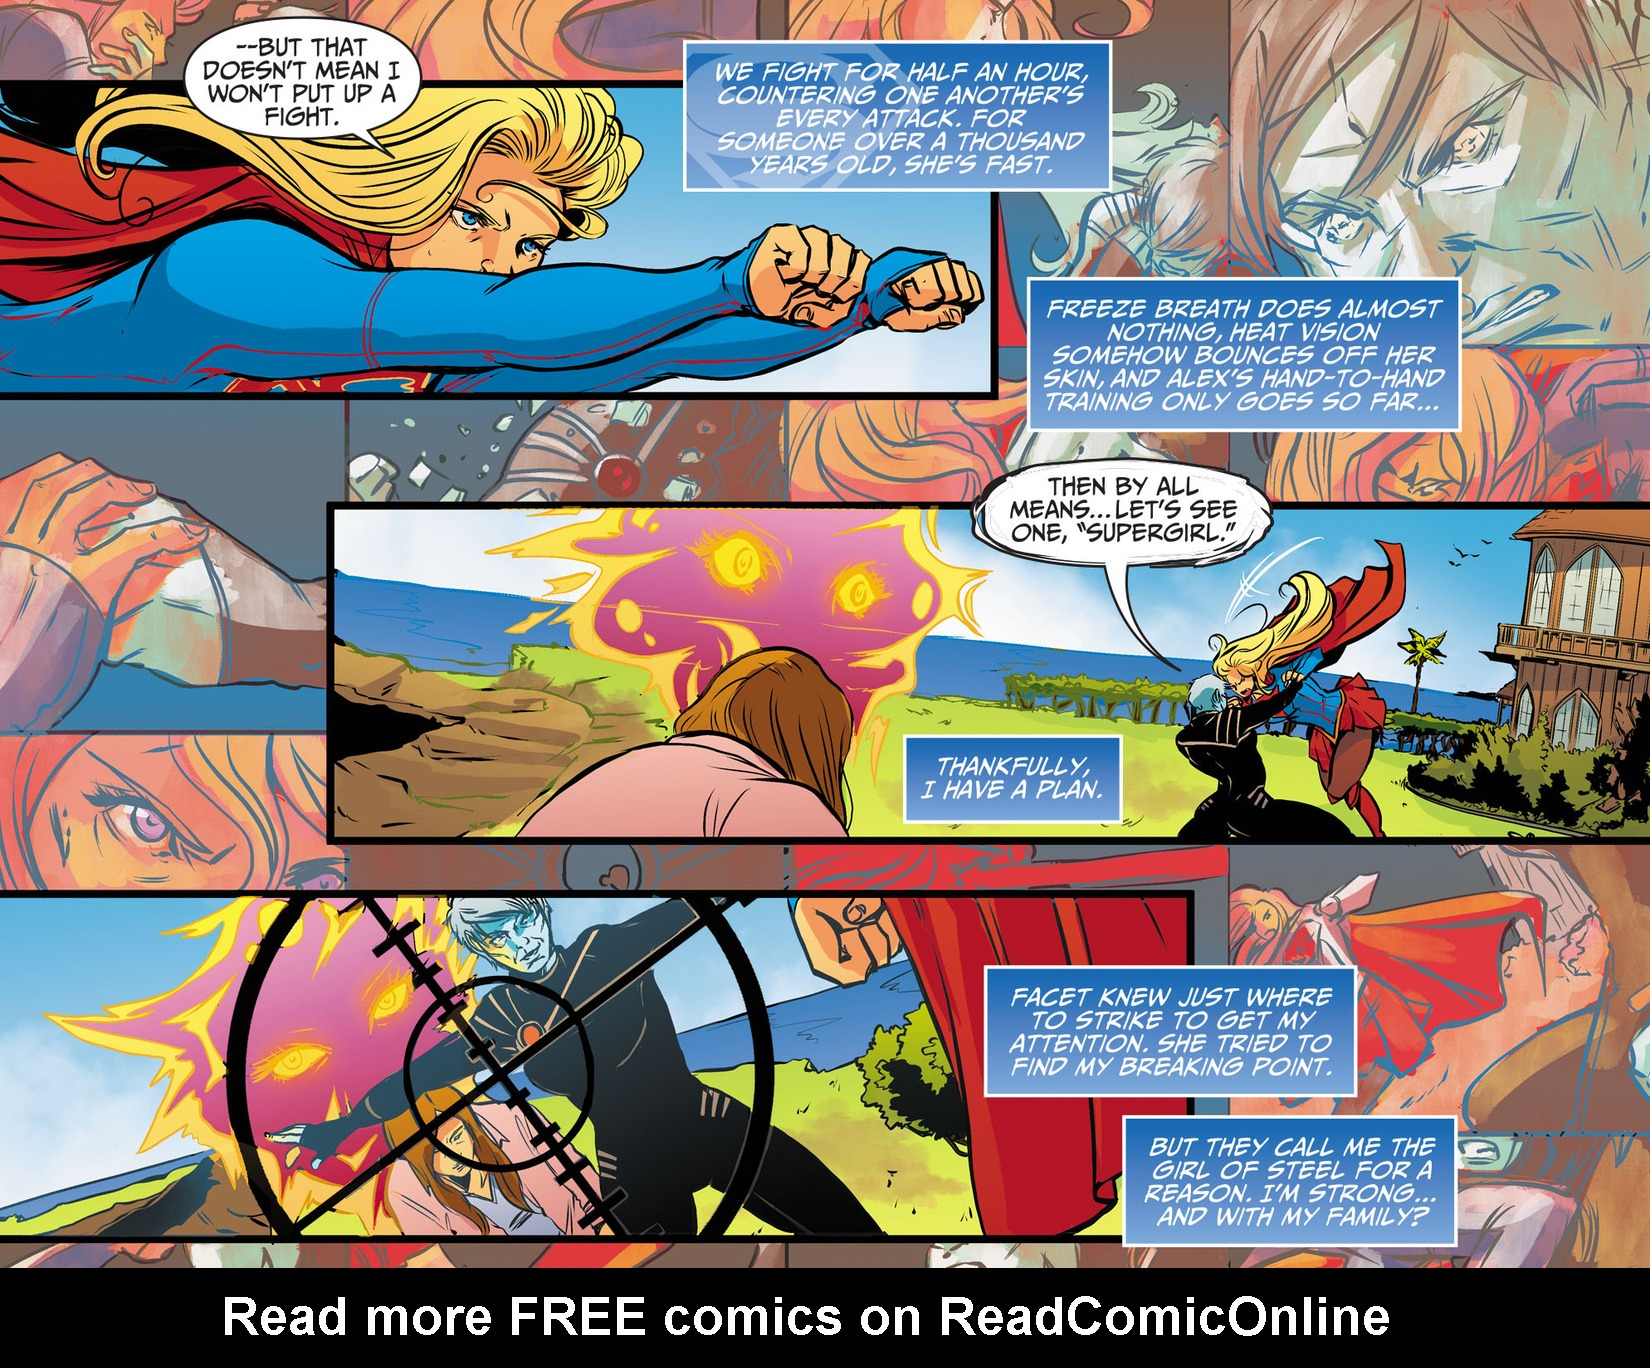 Read online Adventures of Supergirl comic -  Issue #13 - 11